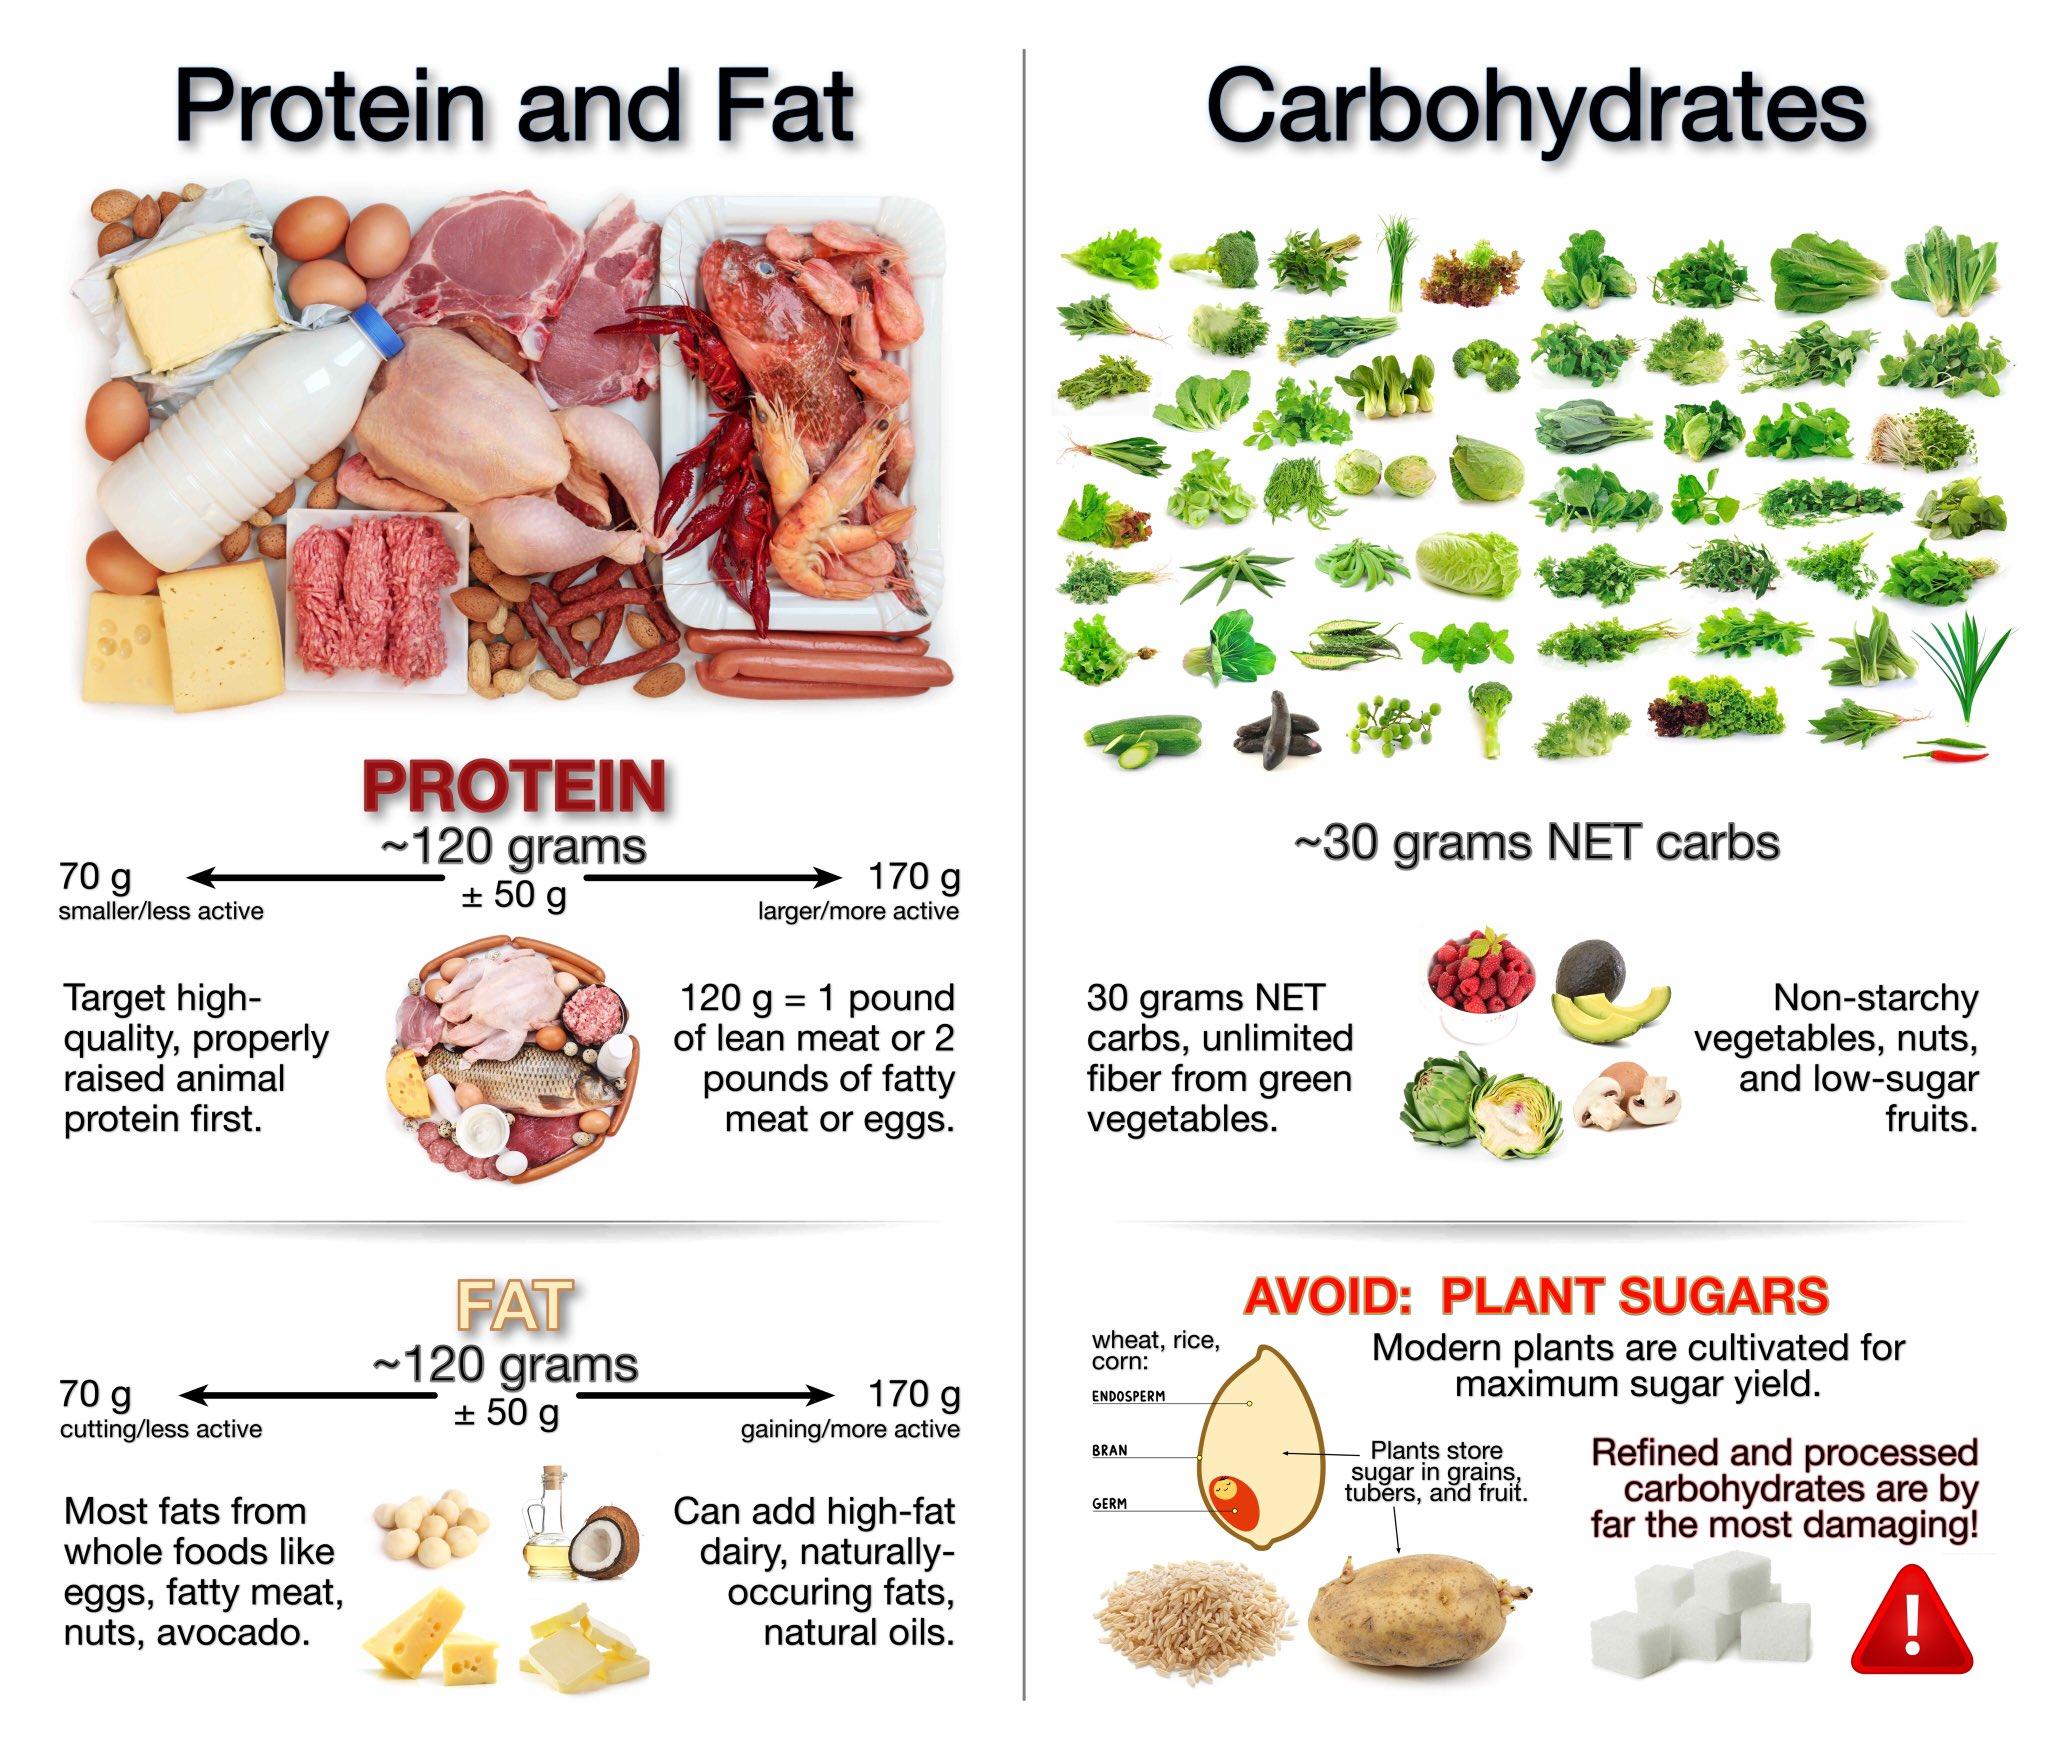 Do you think keto is healthy? — MyFitnessPal.com